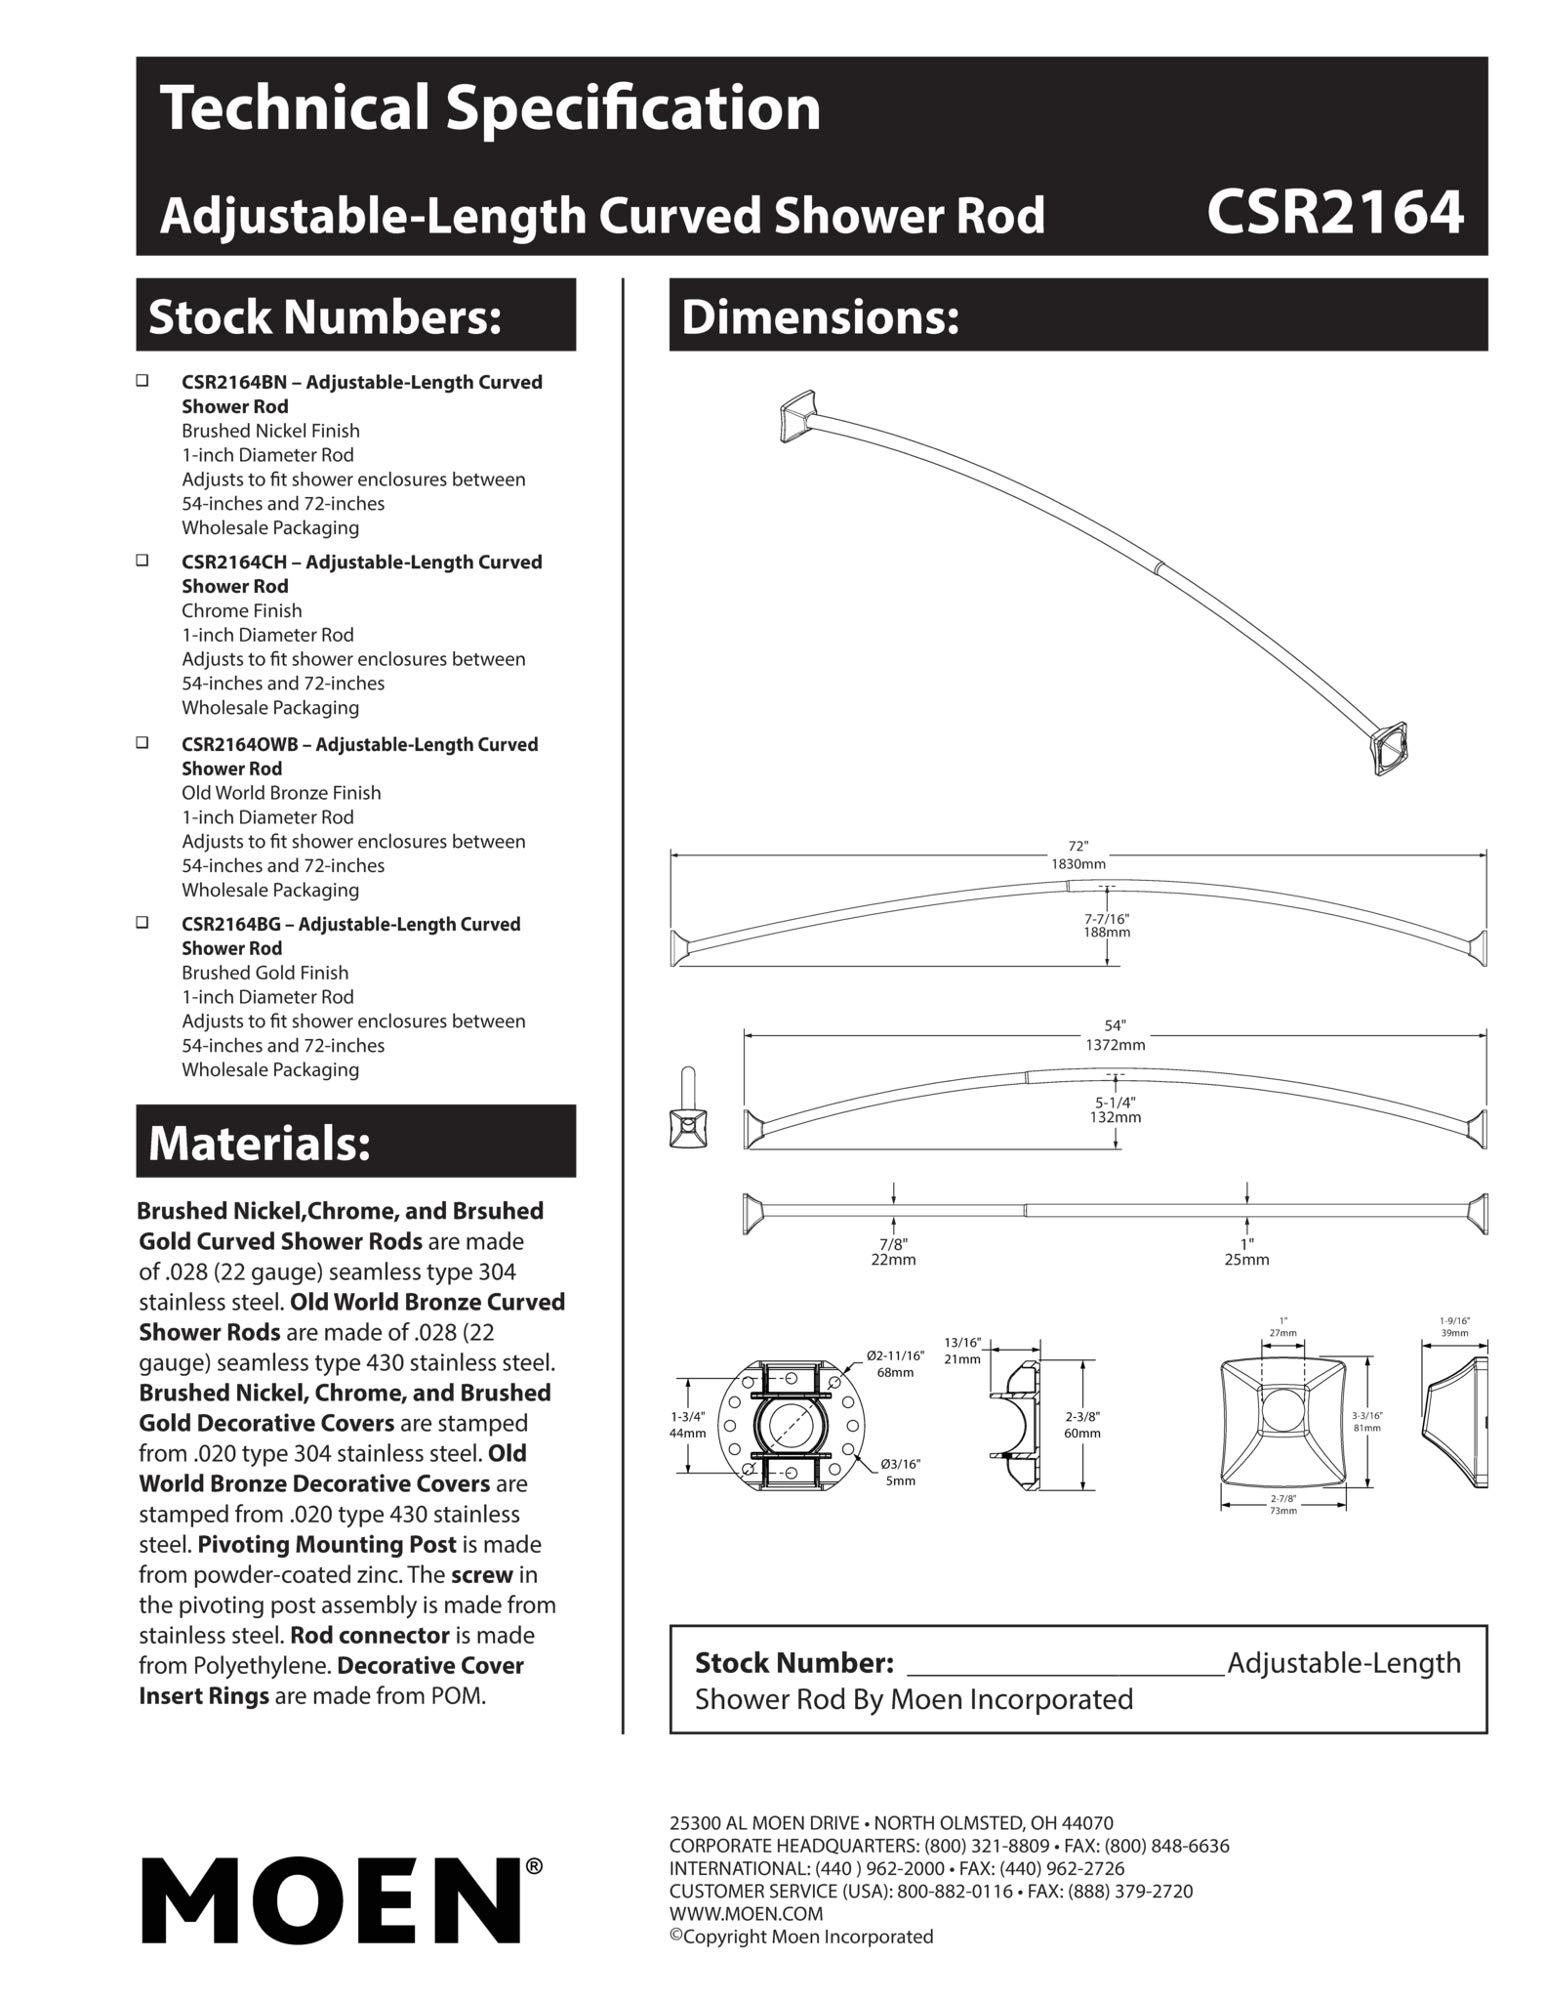 Moen CSR2164CH 72-Inch Permanent Mount Adjustable Curved Shower Rod, Chrome